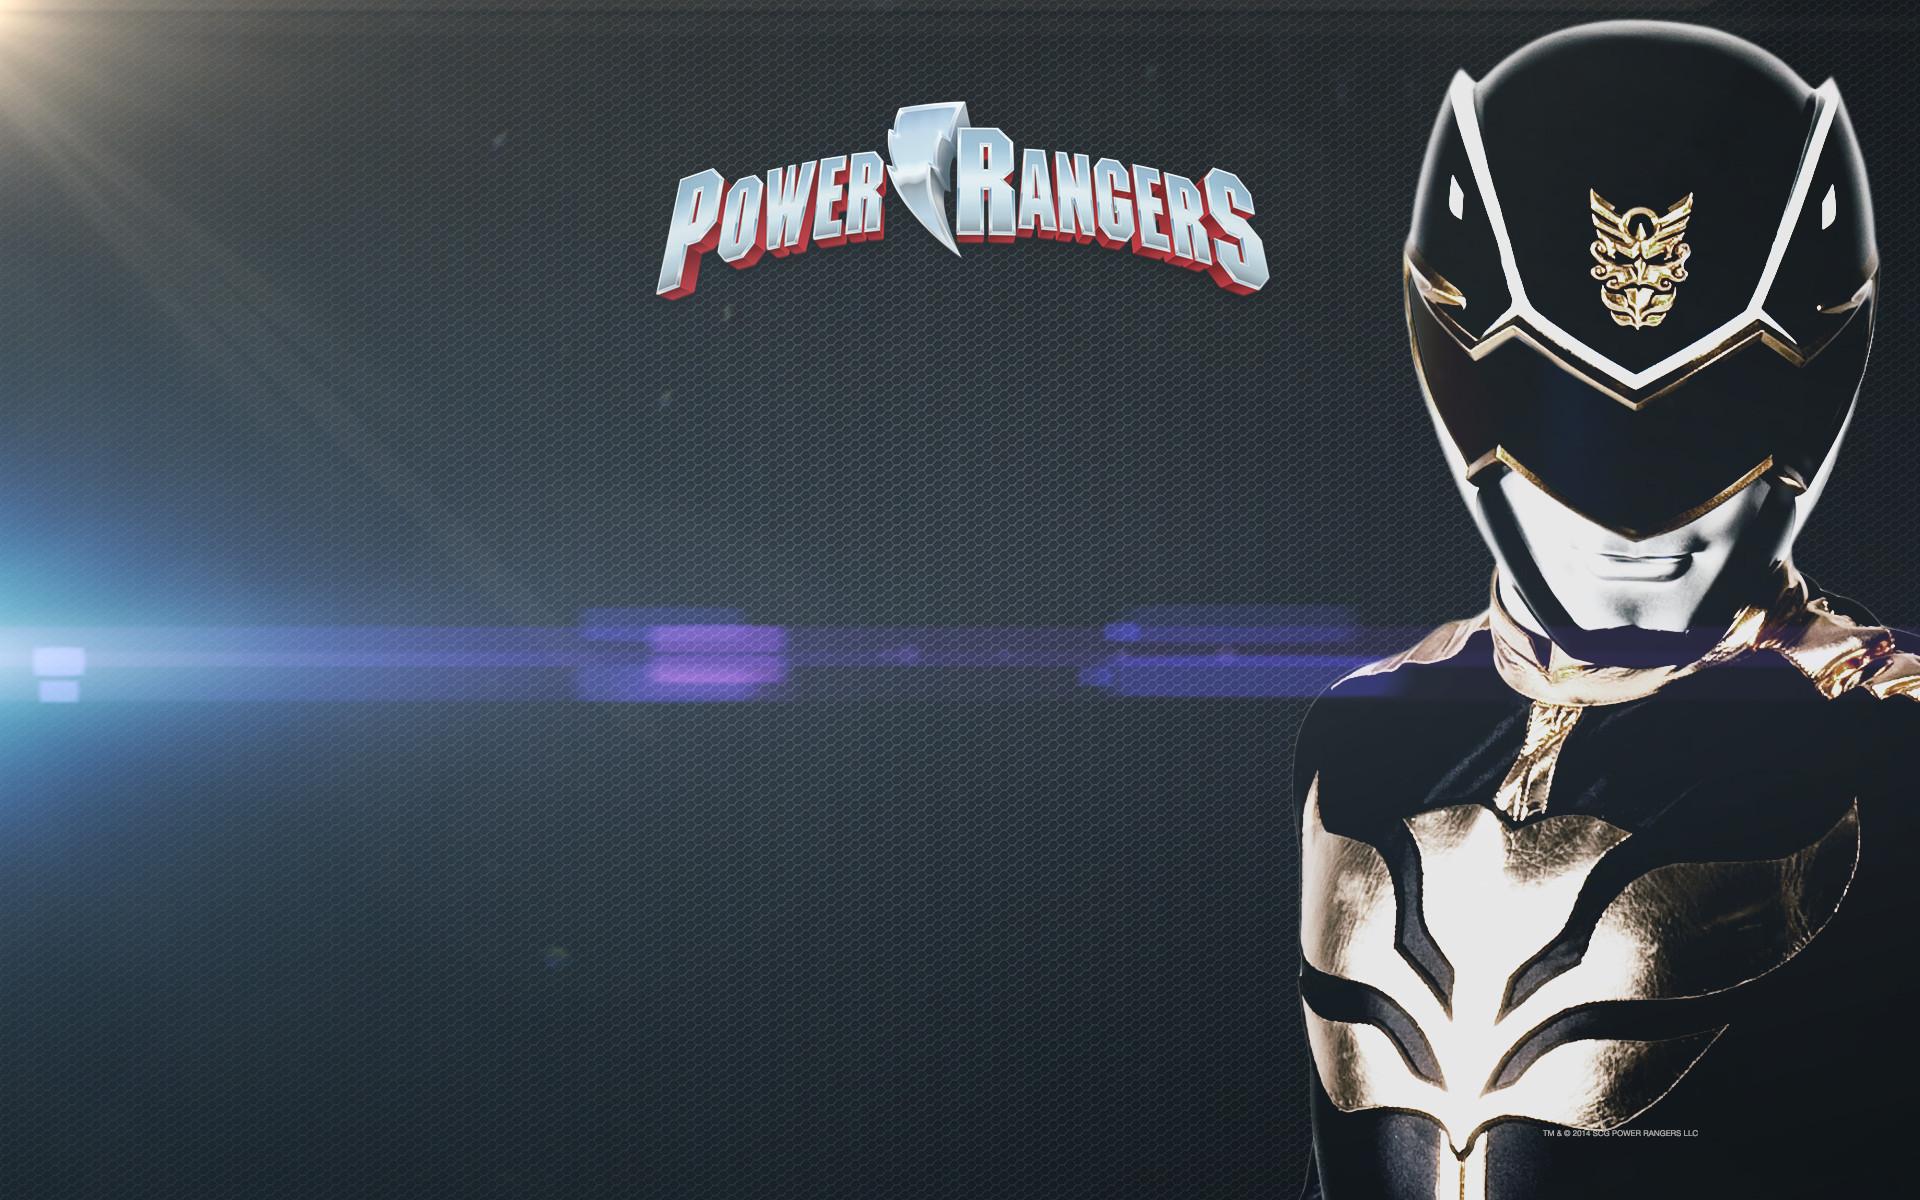 Res: 1920x1200, Power Rangers Wallpaper Megaforce Black Fun Desktop Wallpapers for